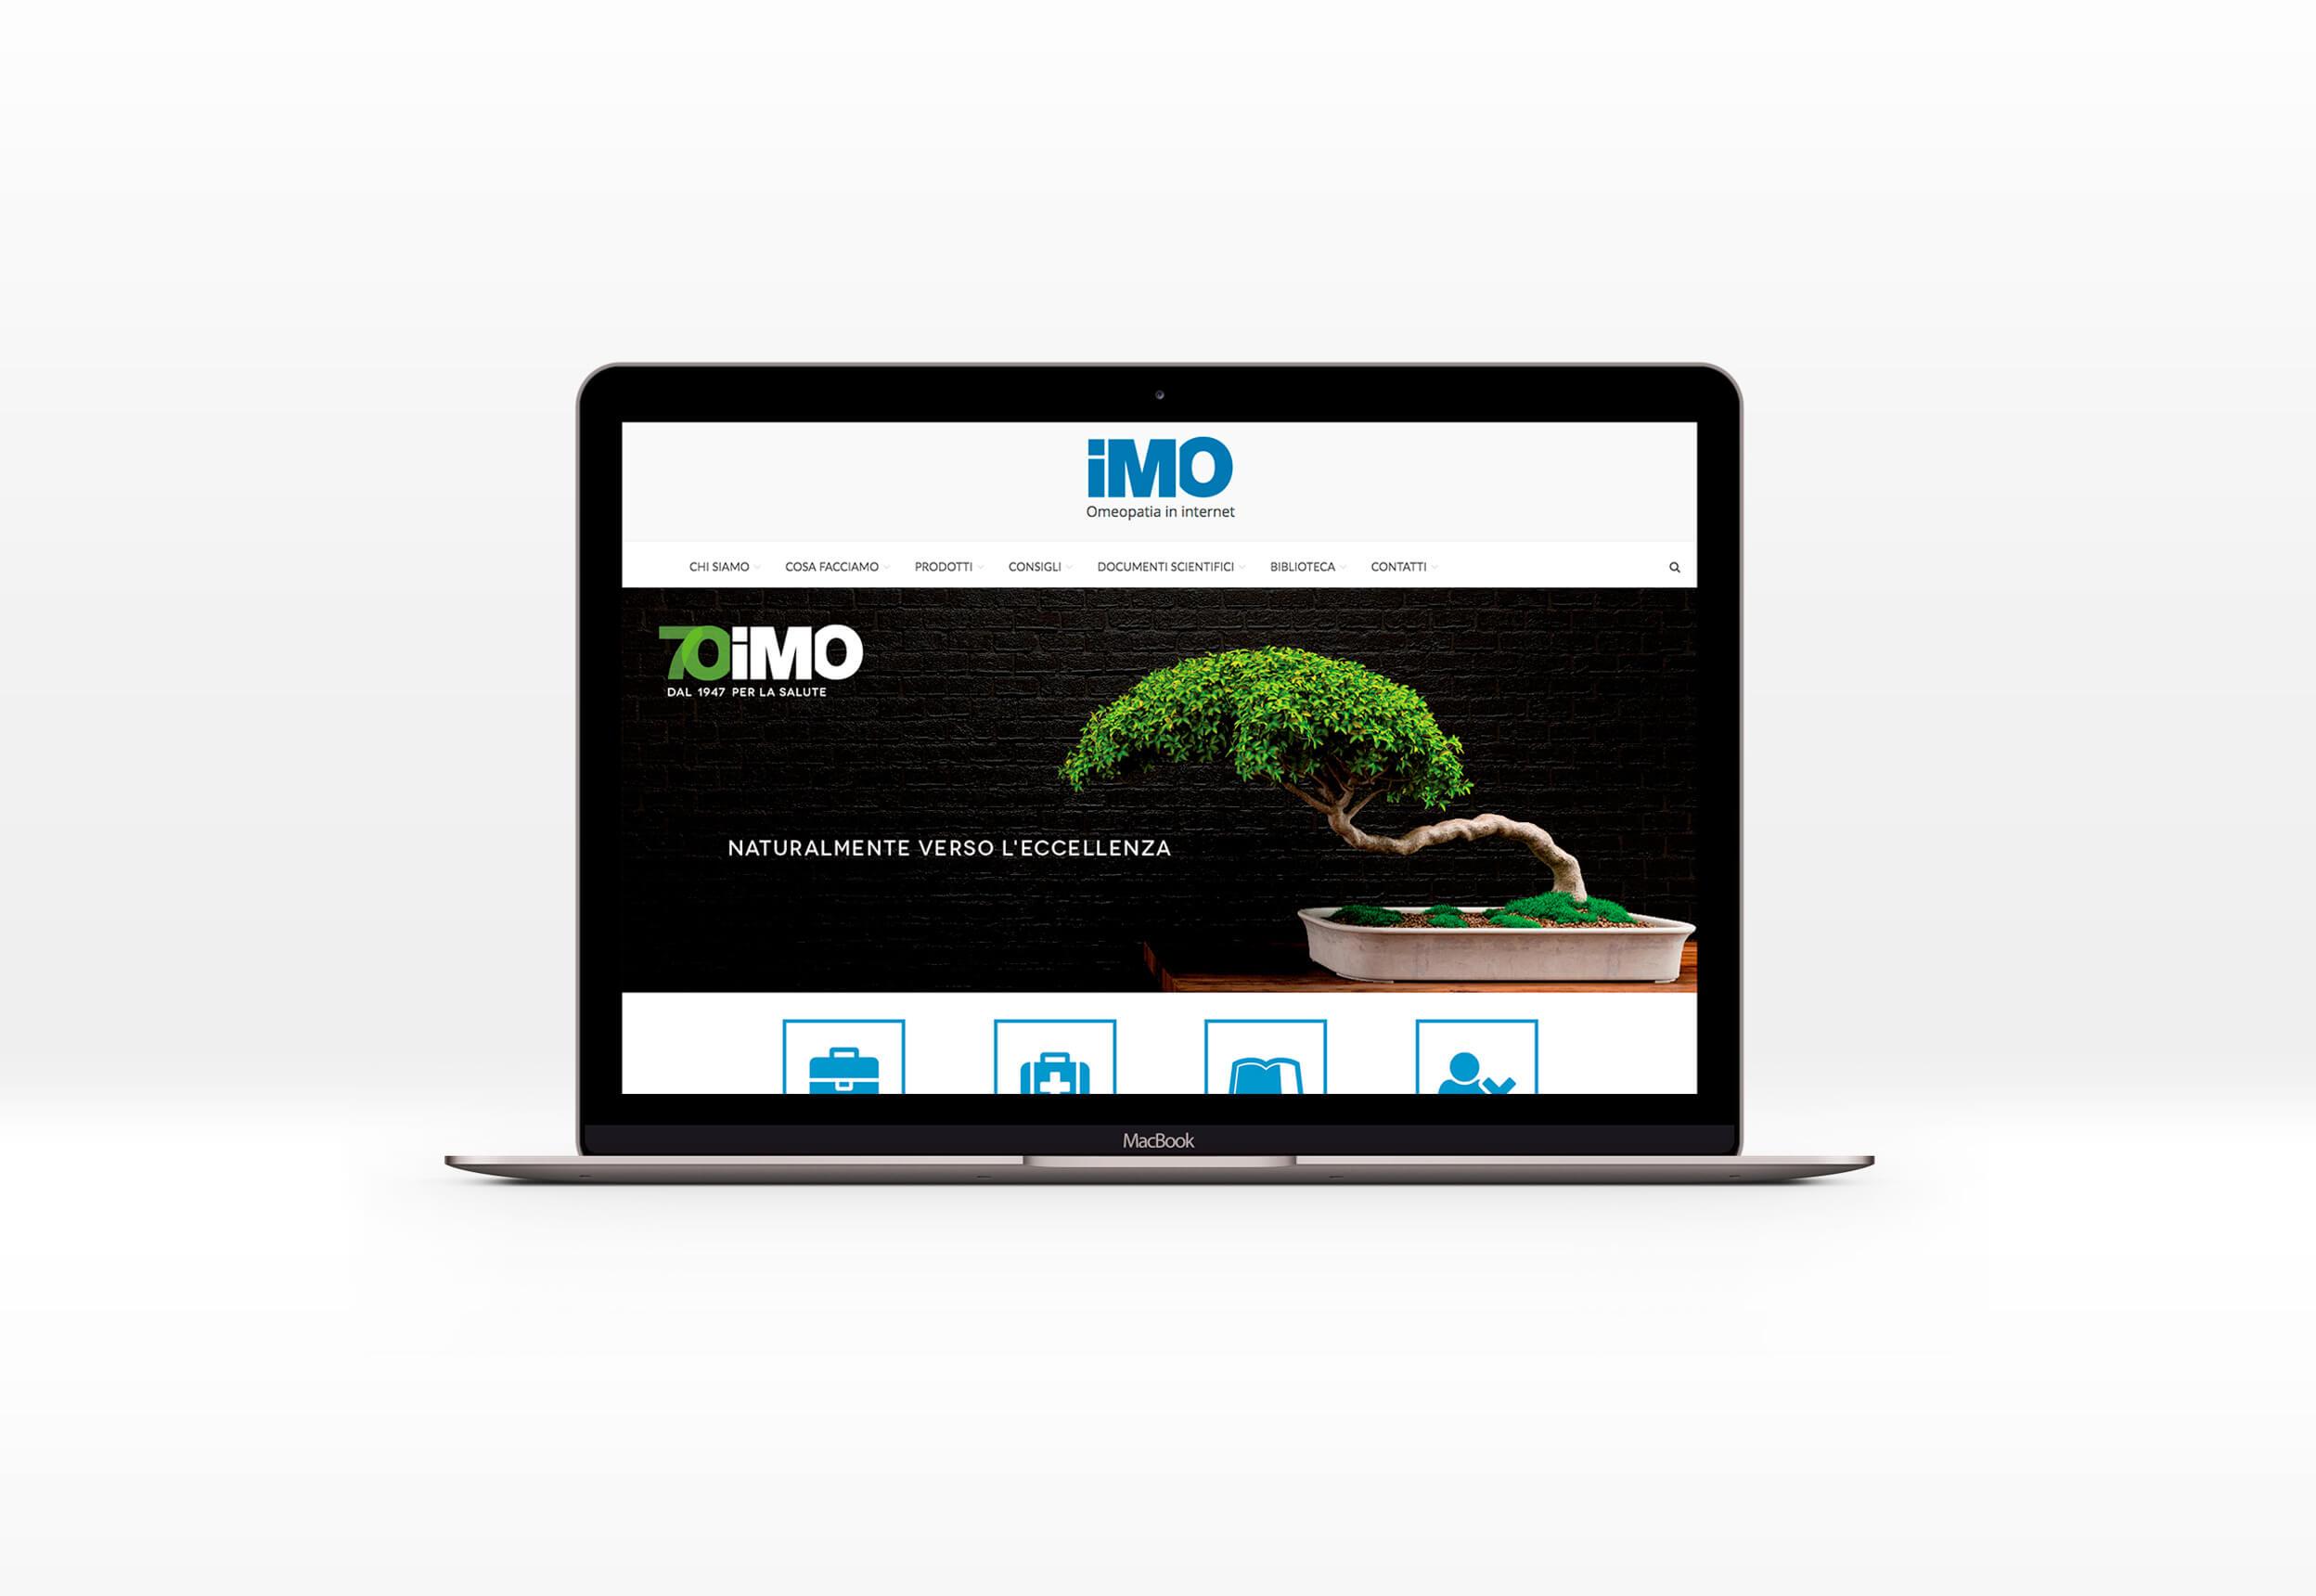 imo_70th_anniversary-web_slide